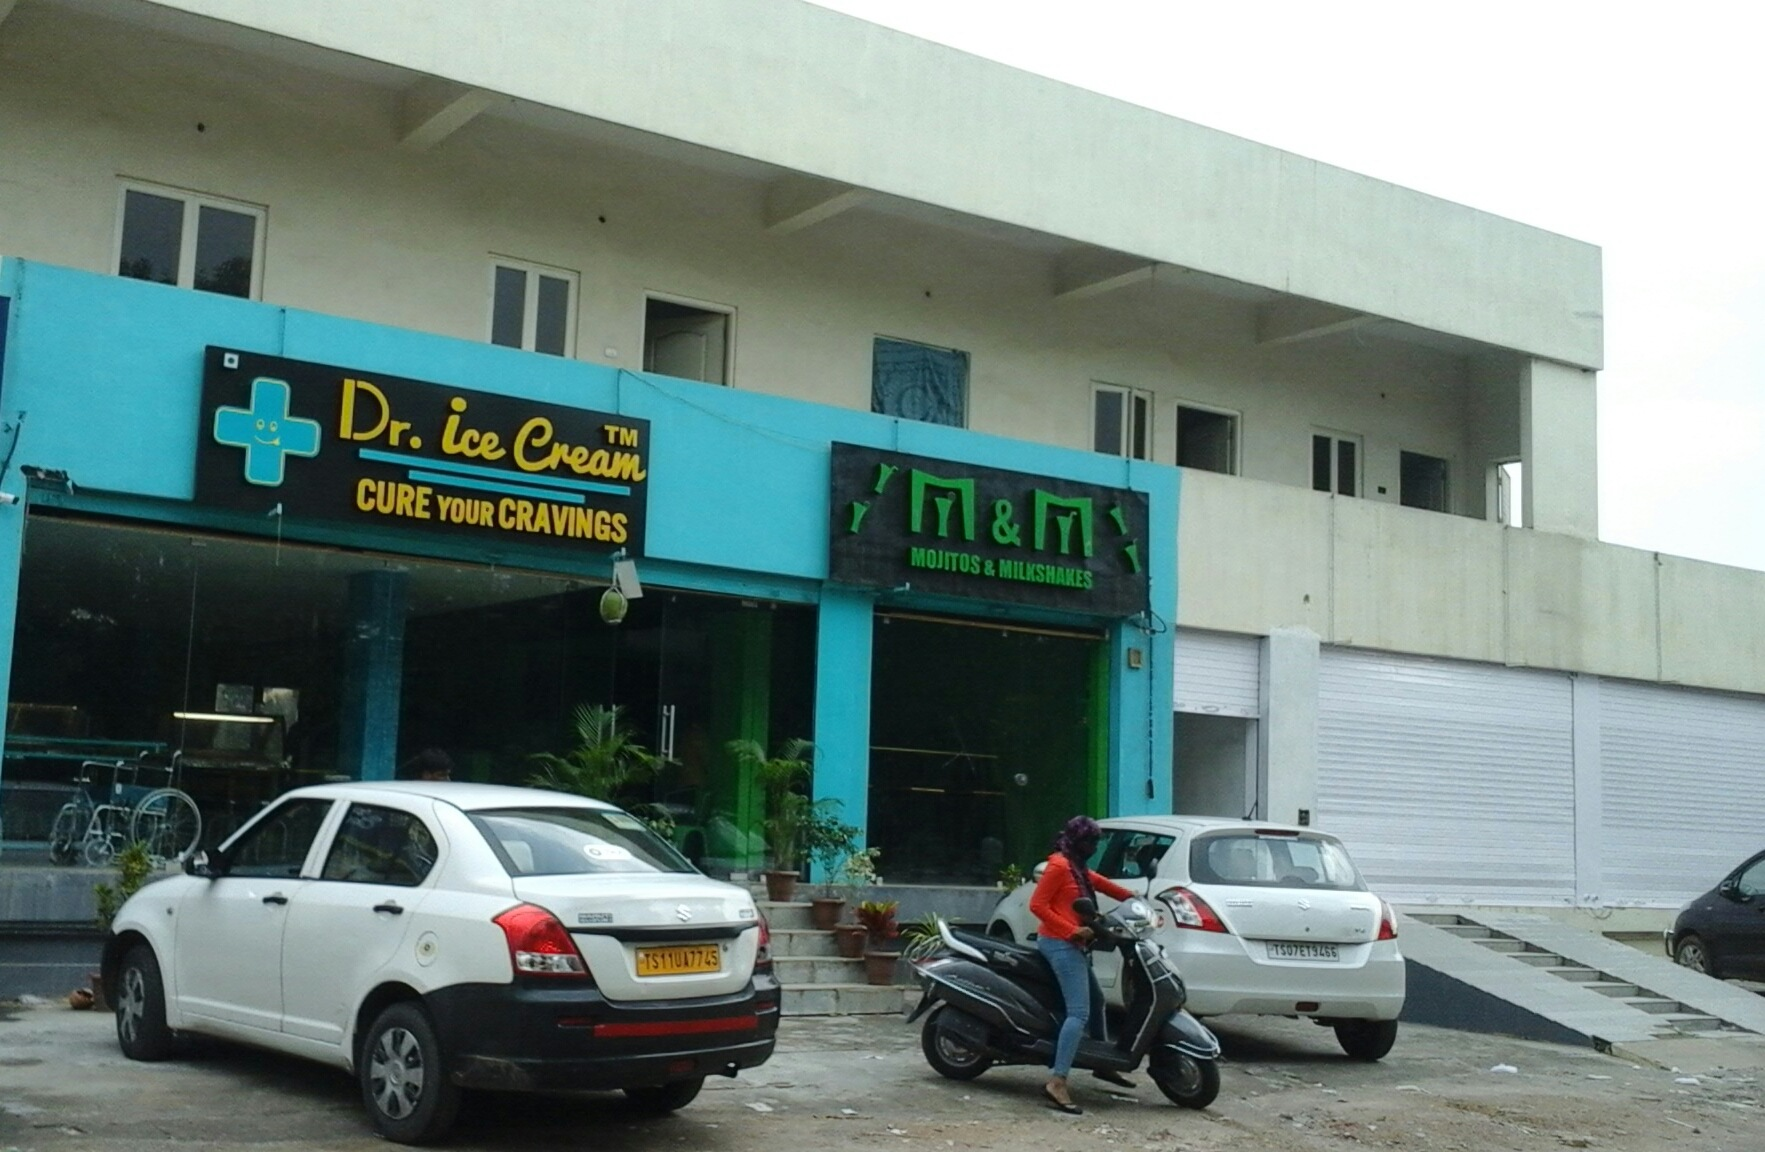 Dr. Ice Cream by smita singh